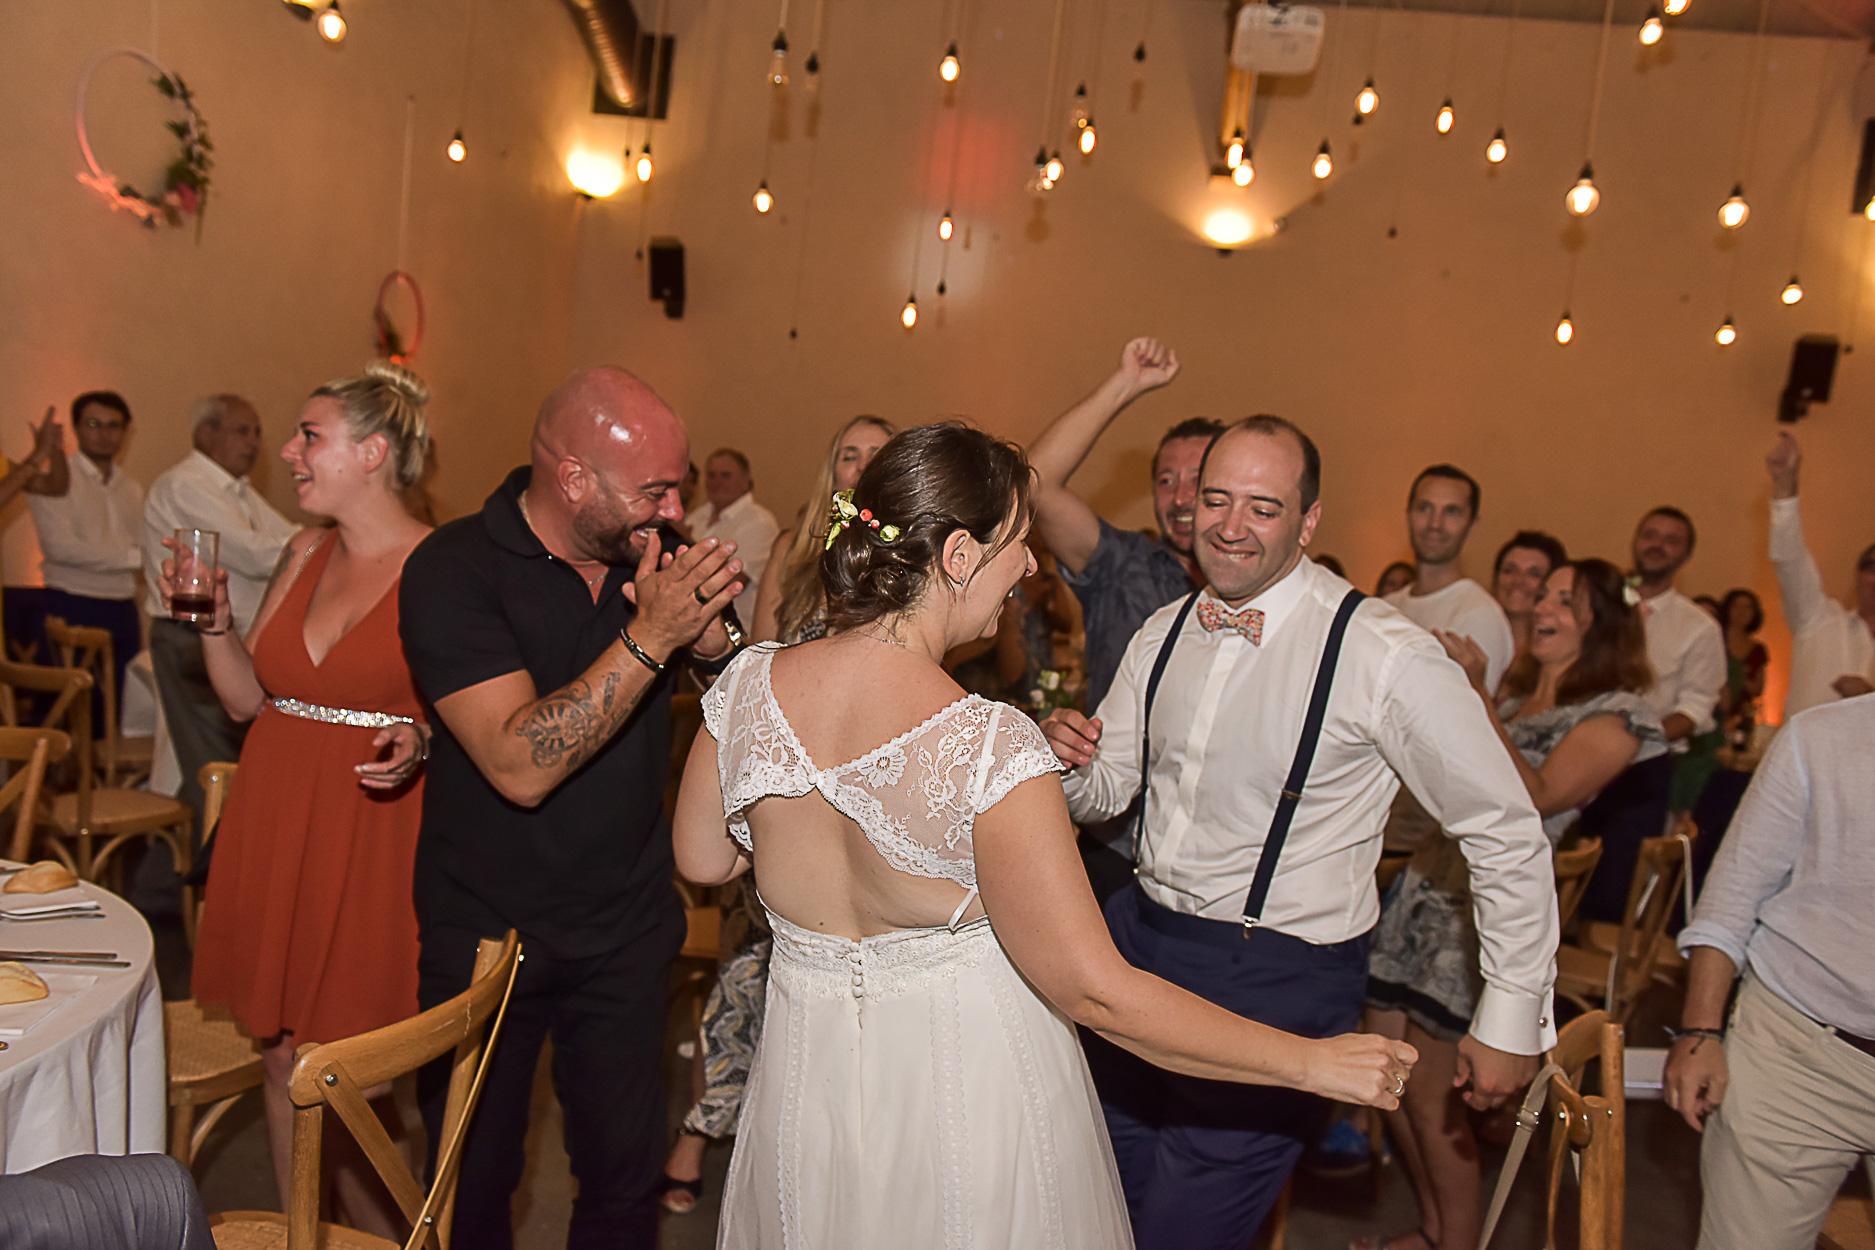 photographe-mariage-soiree-ferme-armenon-entree-maries